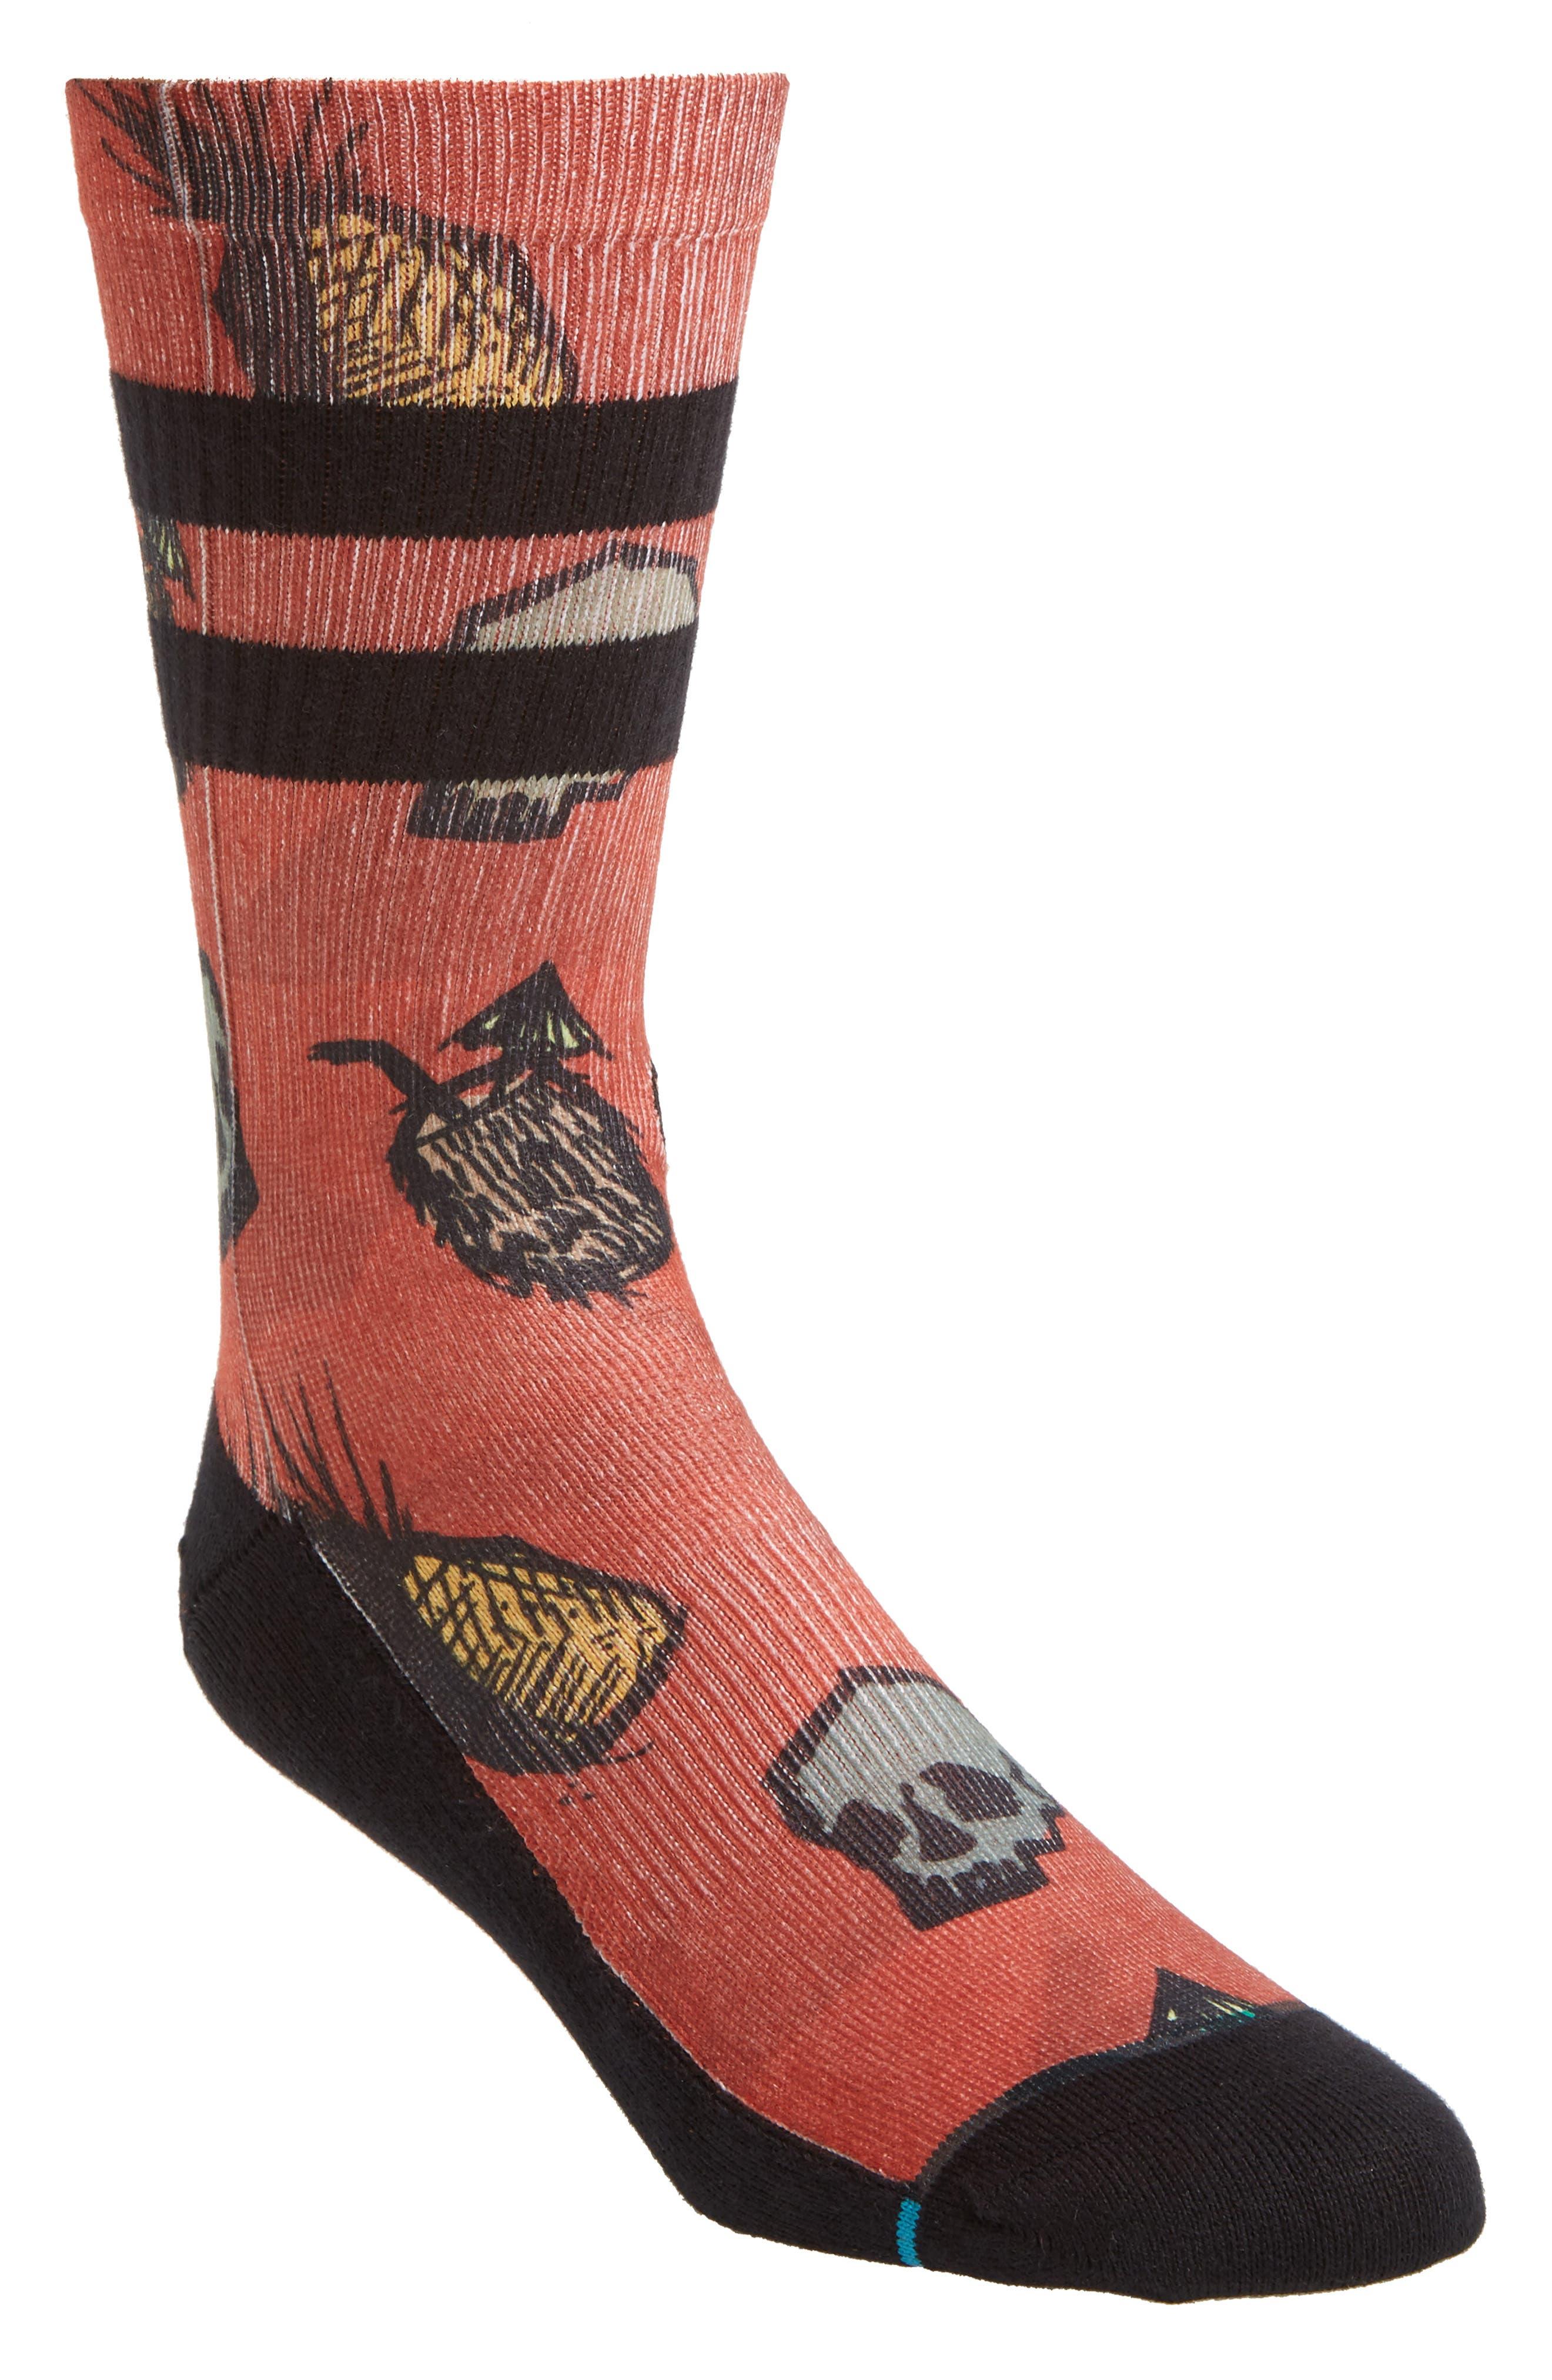 Poolboy Socks,                             Main thumbnail 1, color,                             600